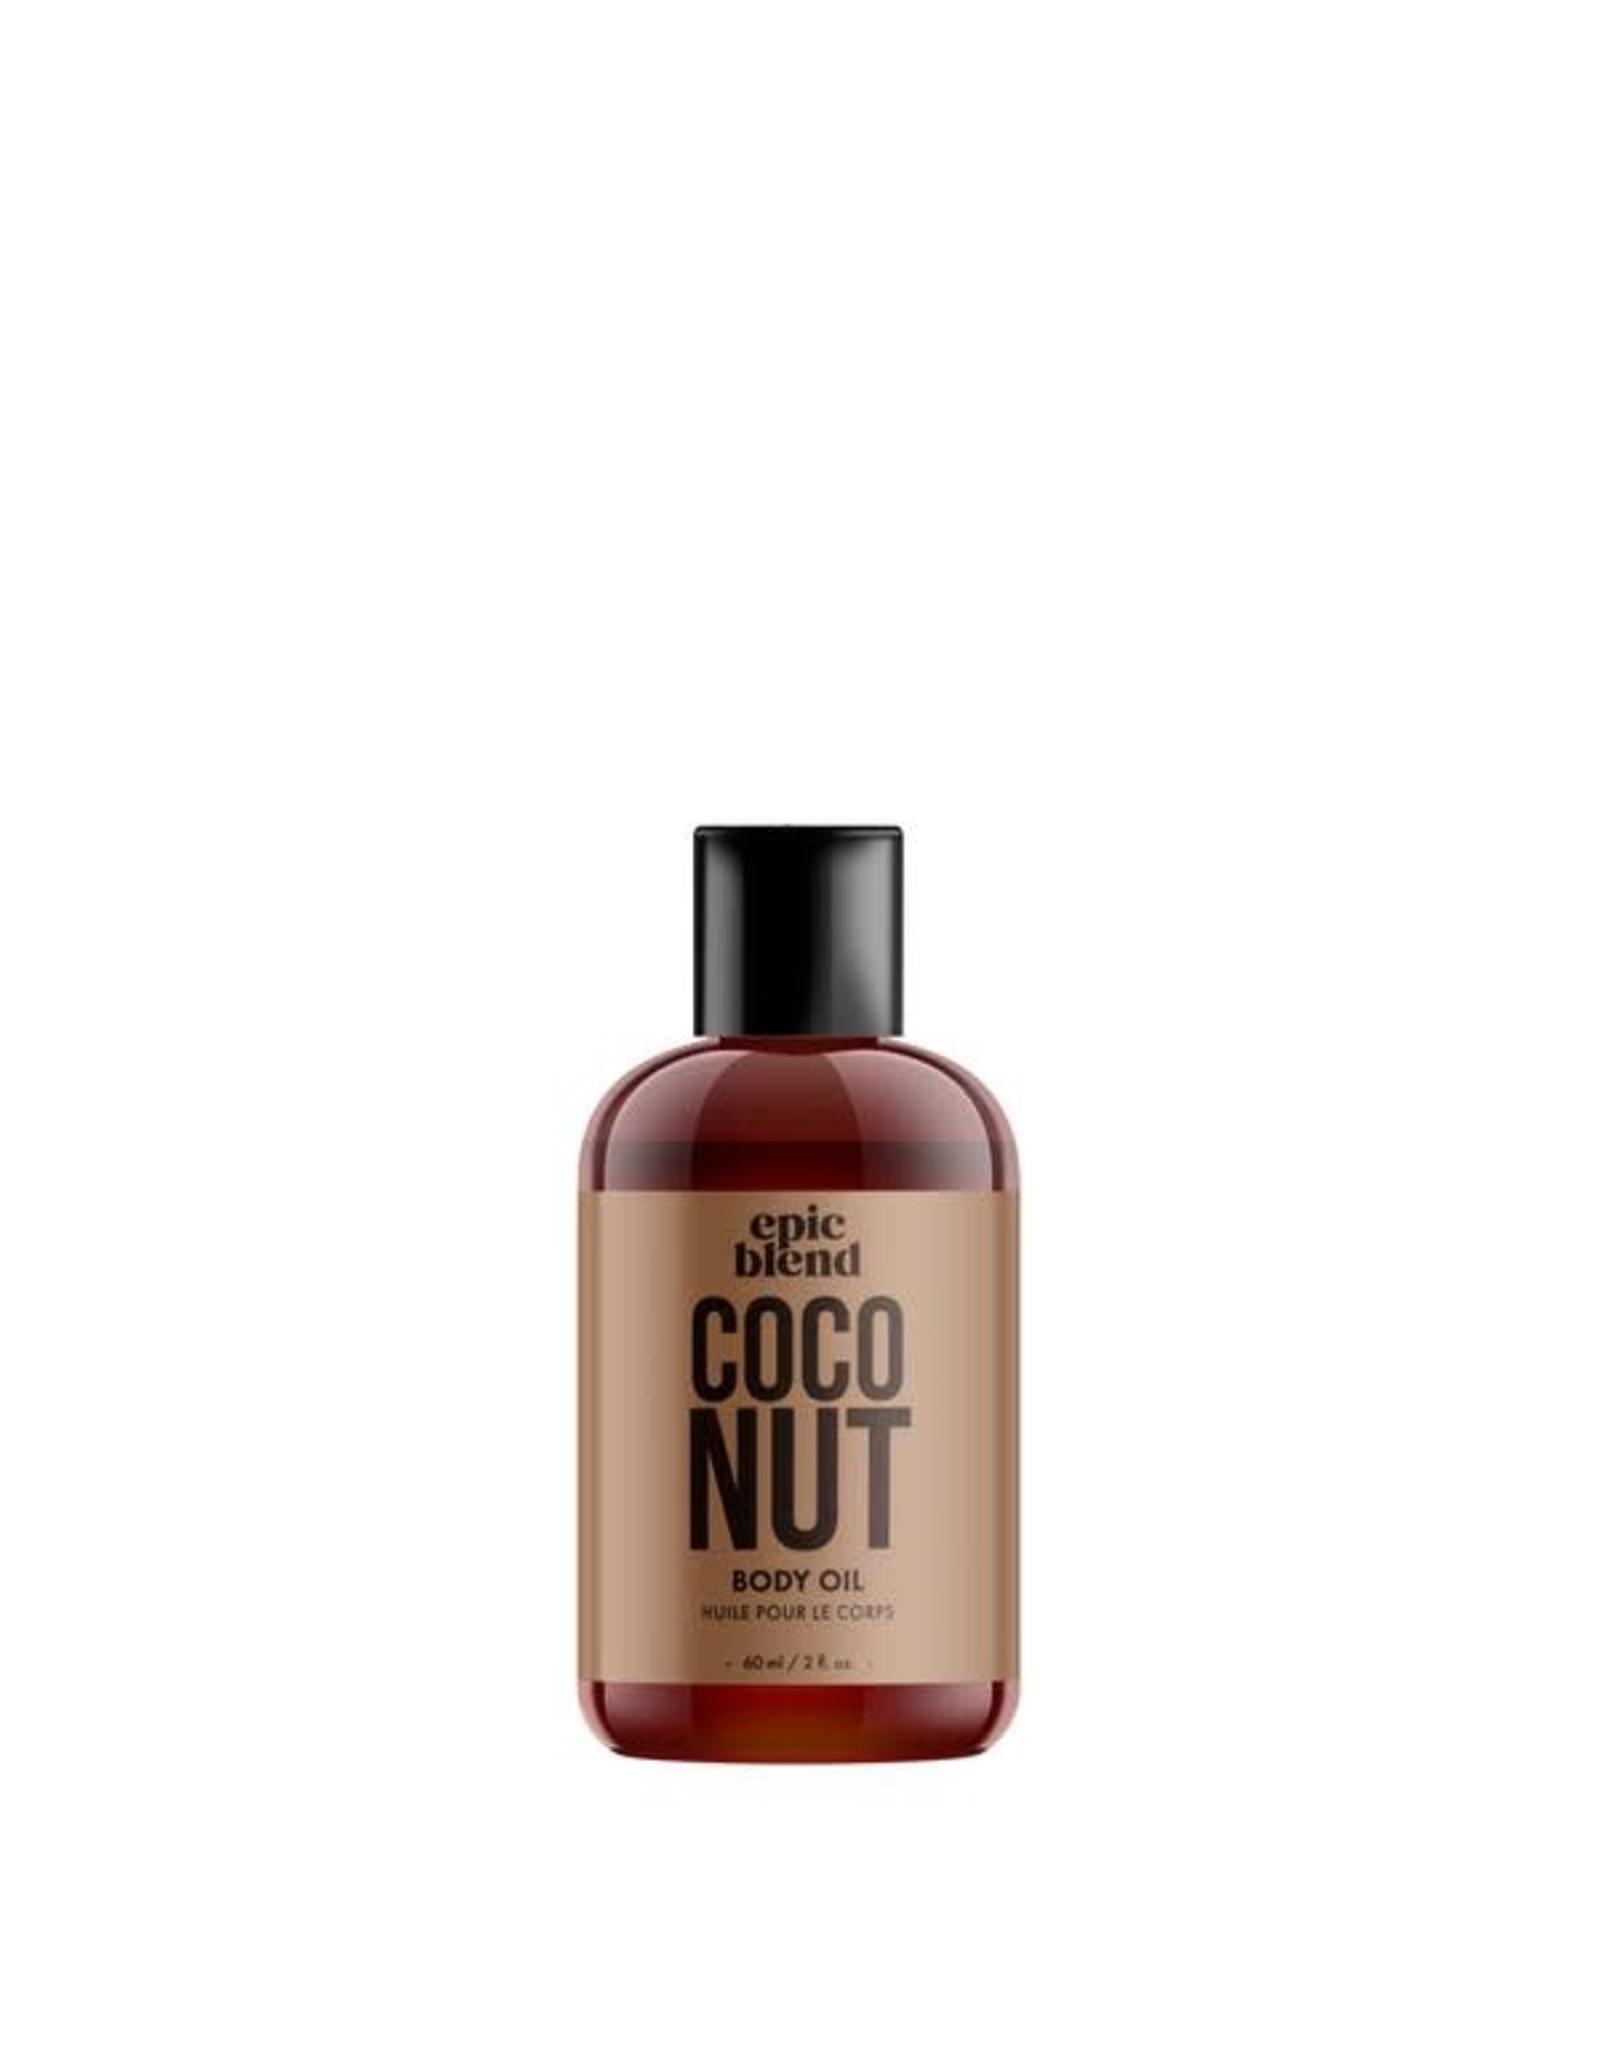 Epic Blend Coconut Body Oil